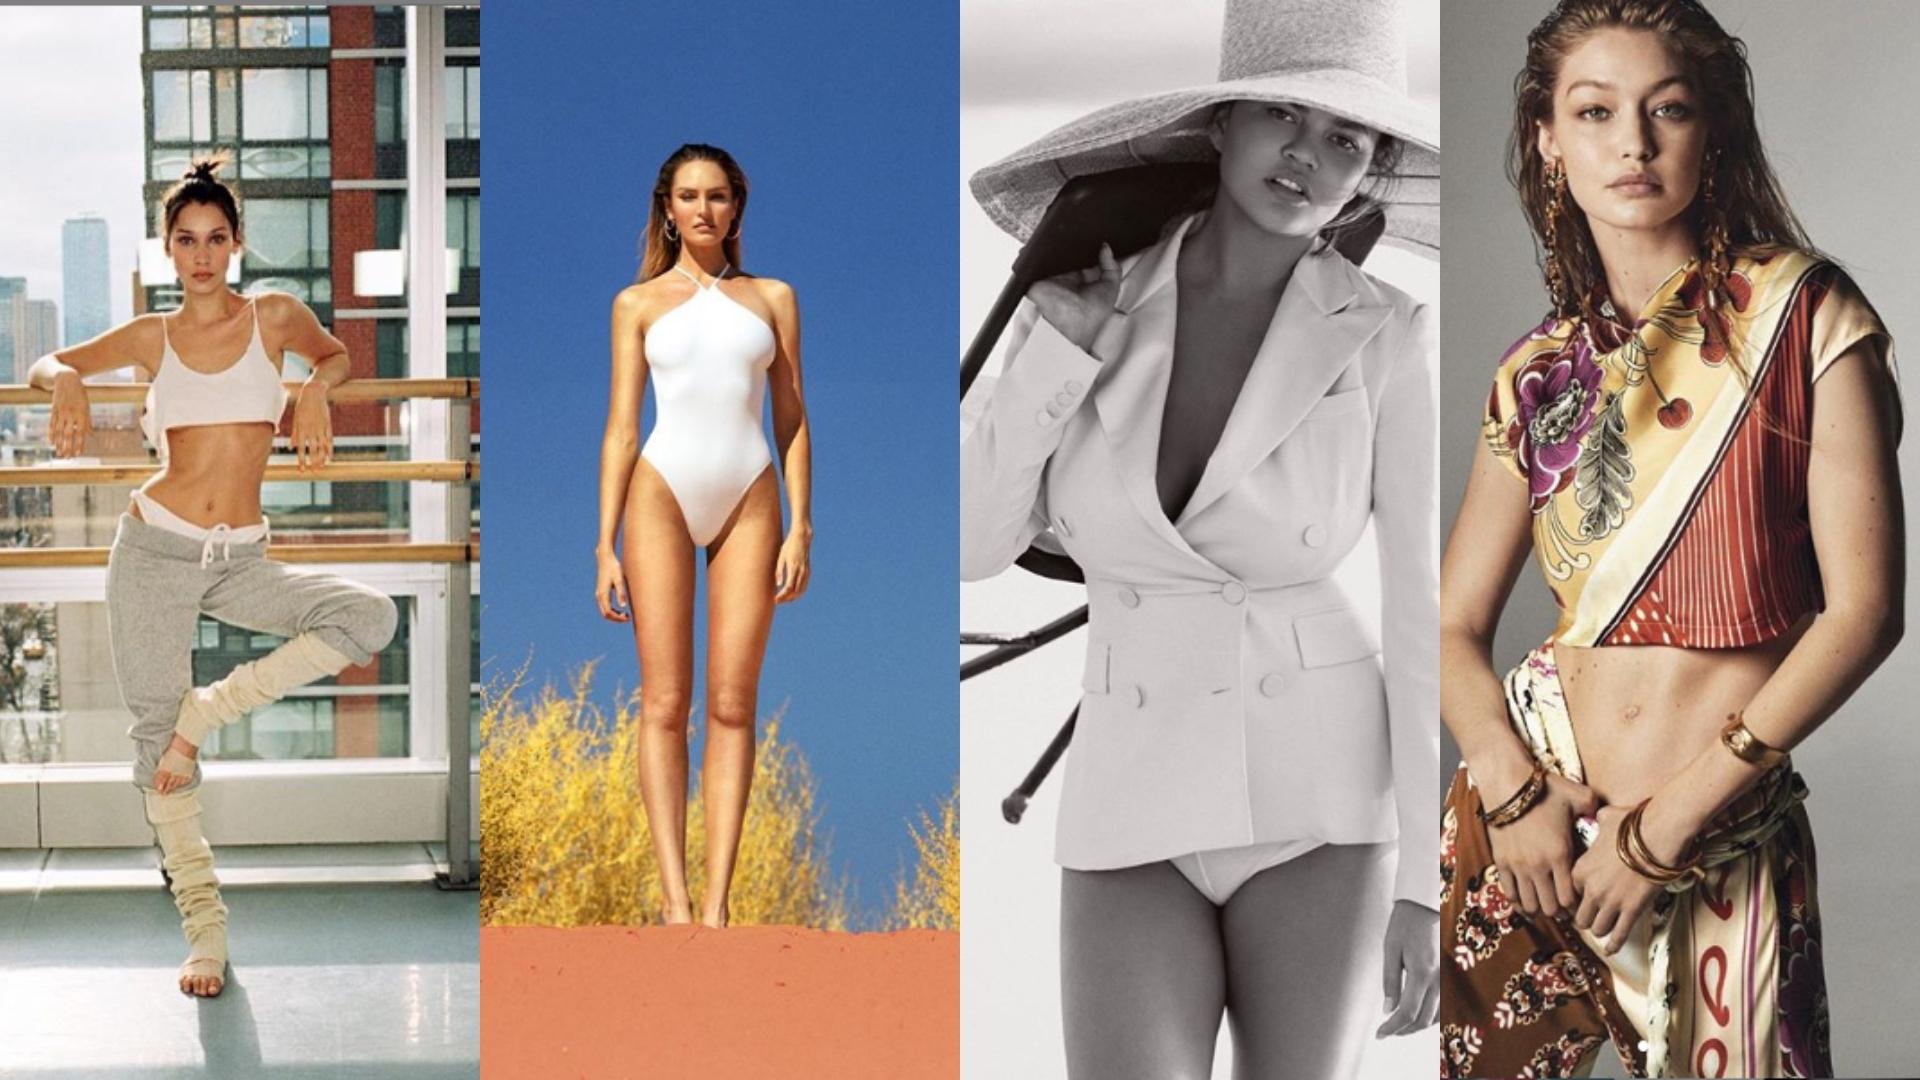 Top 10 Instagram Models to follow in 2019